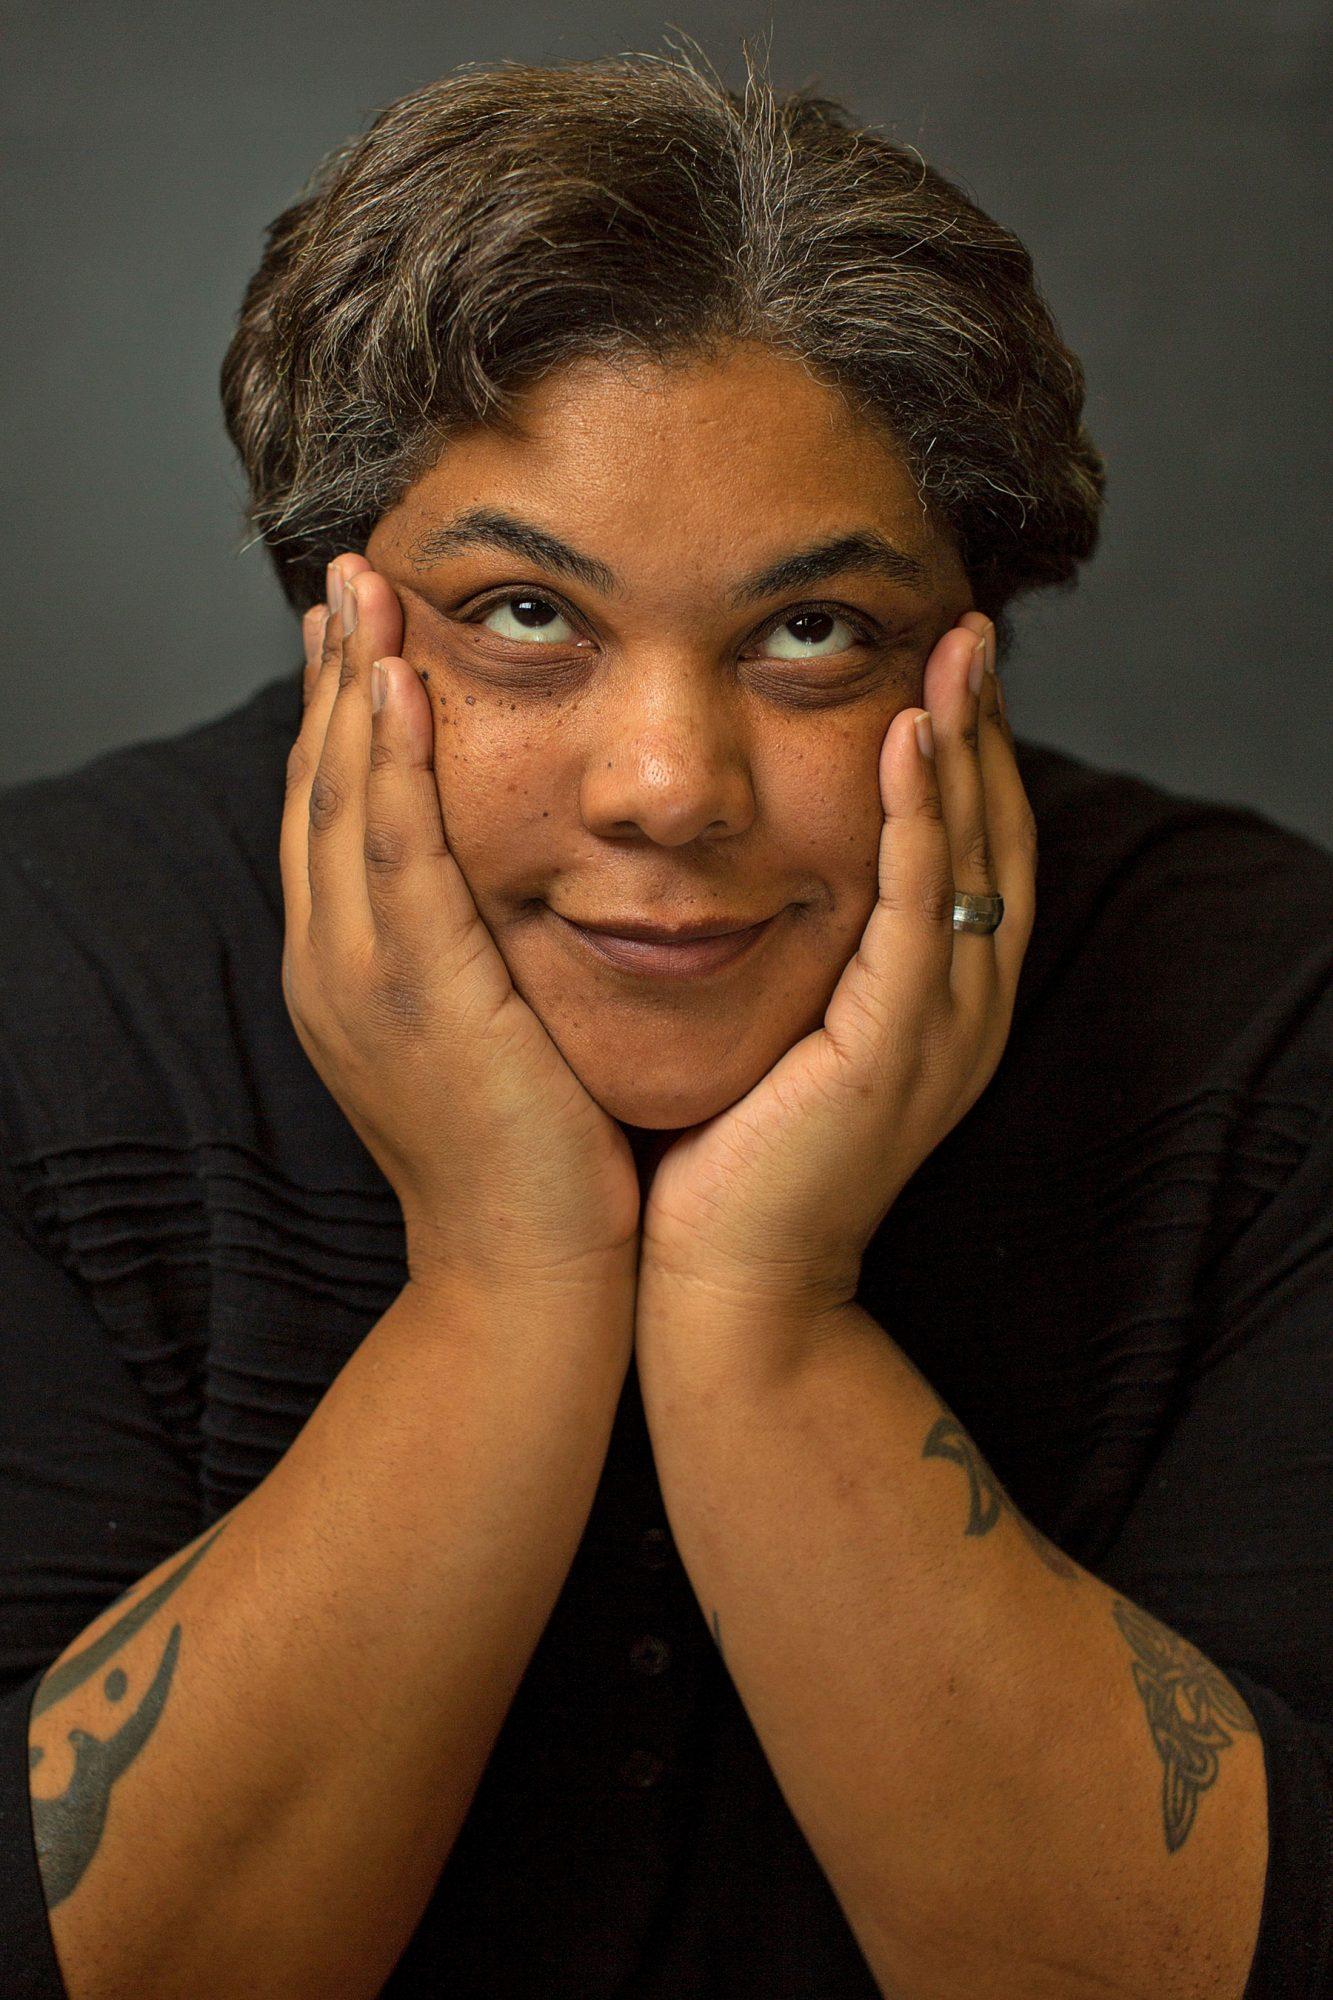 Roxane Gay author of Hunger: A Memoir of (My) Body (6/13/17)